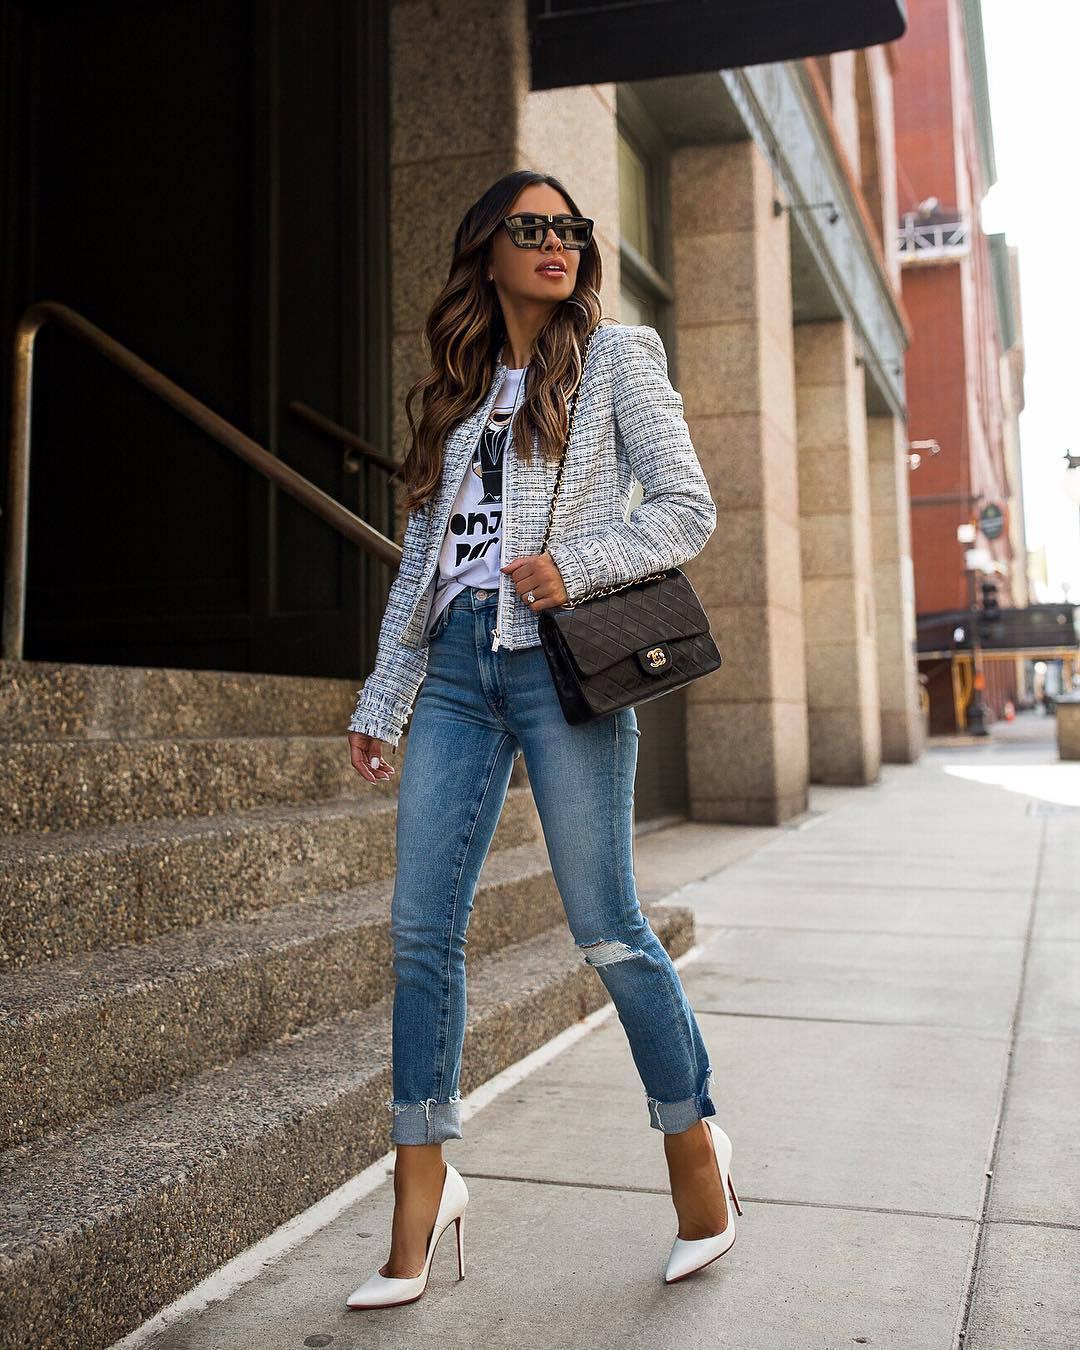 jeans denim blue jeans ripped jeans shoes jacket